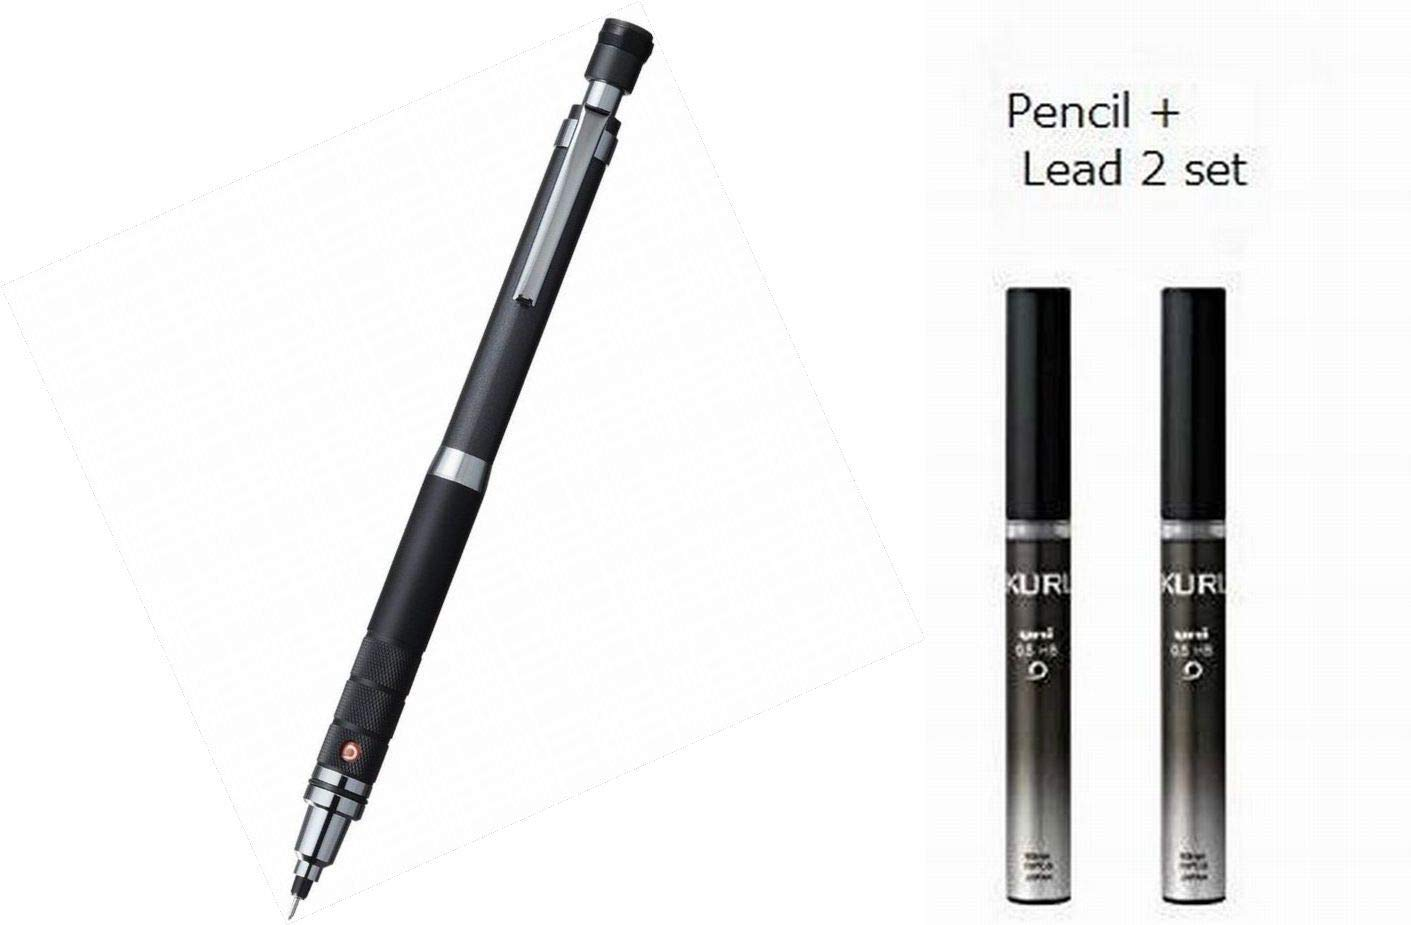 Uni Mechanical Pencil Kuru Toga Roulette Model 0.5mm Gun Metallic (M510171P.43) + Lead 2 Set (Pencil : Lead : U05203HB.24) by uni